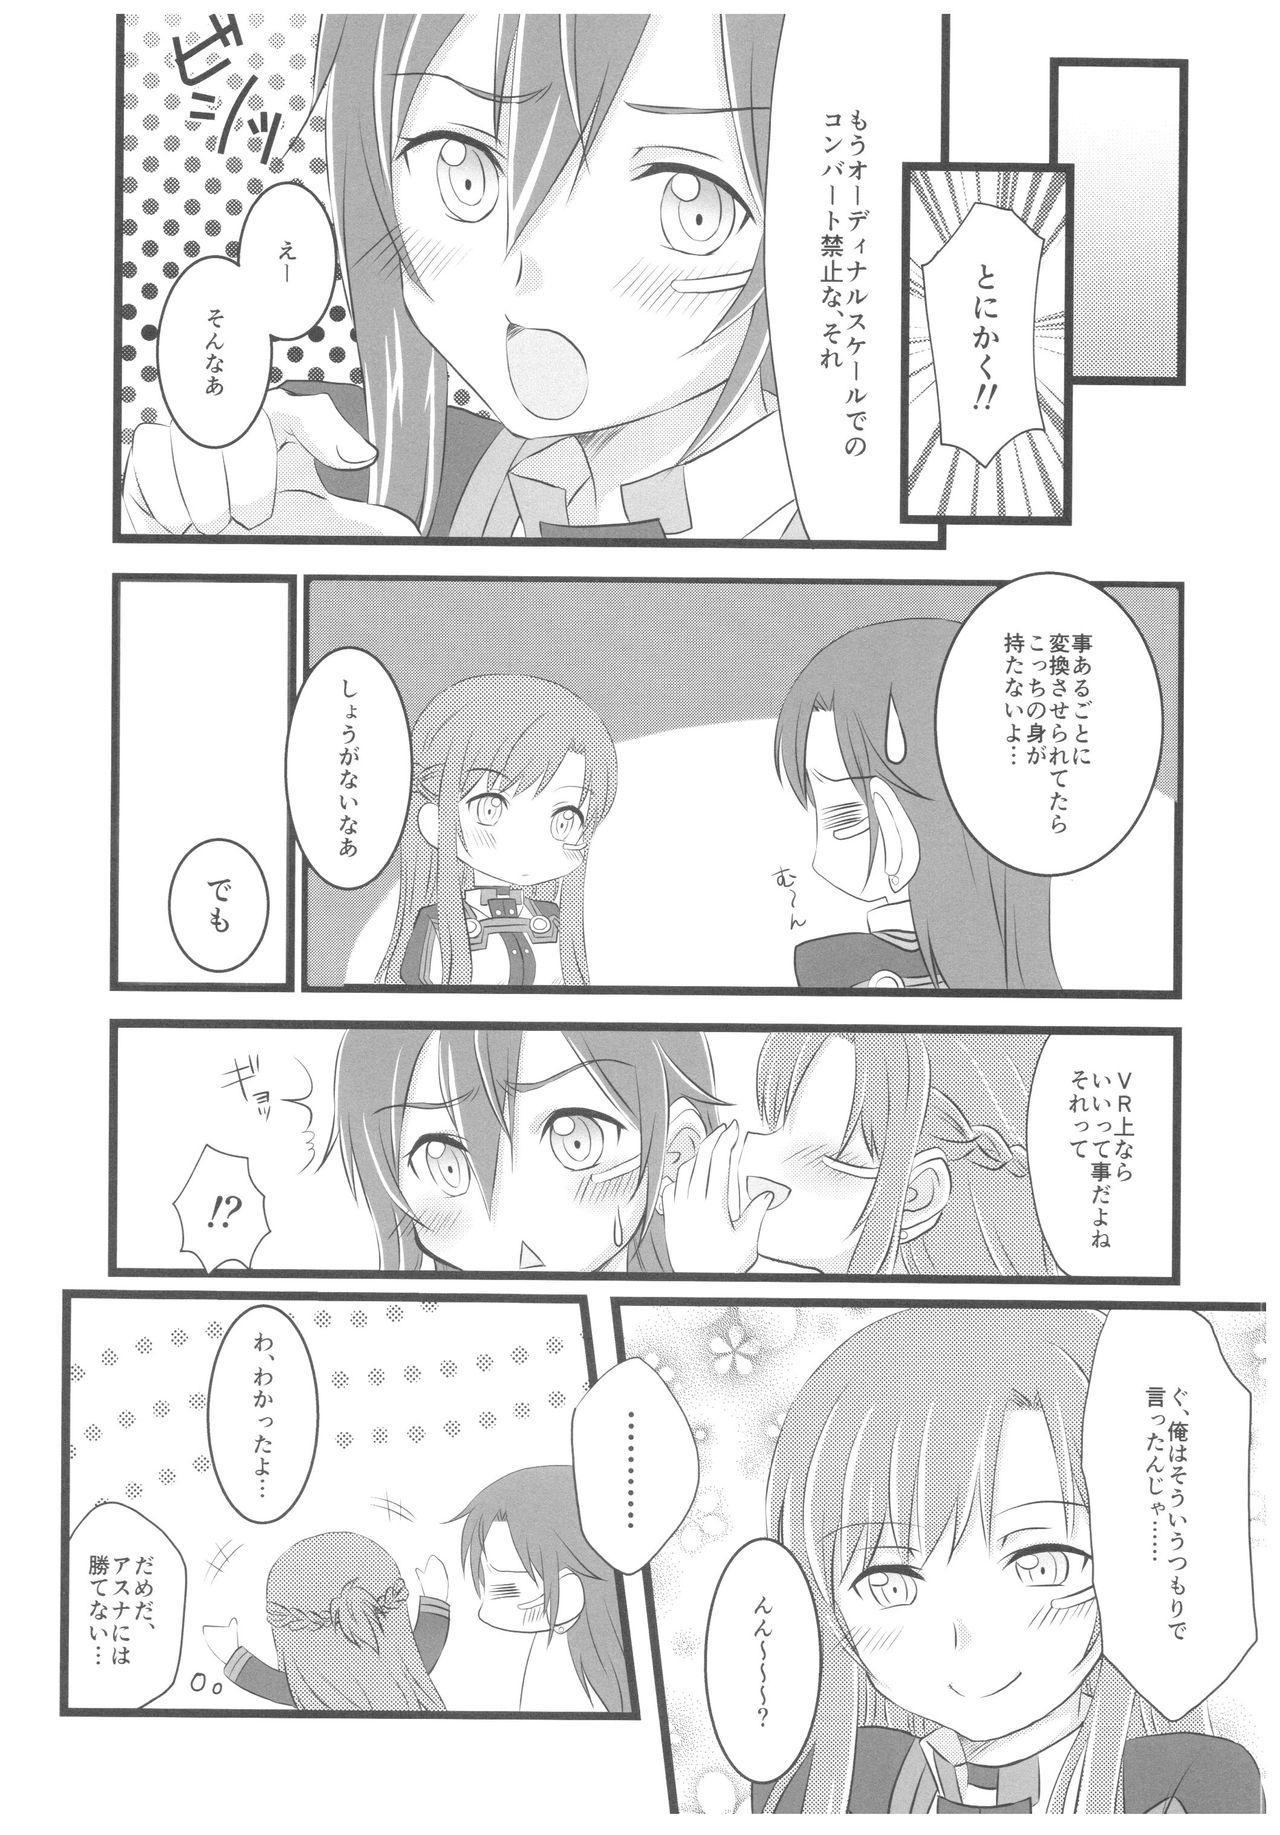 Kiriko-chan to Asobou! 4 17